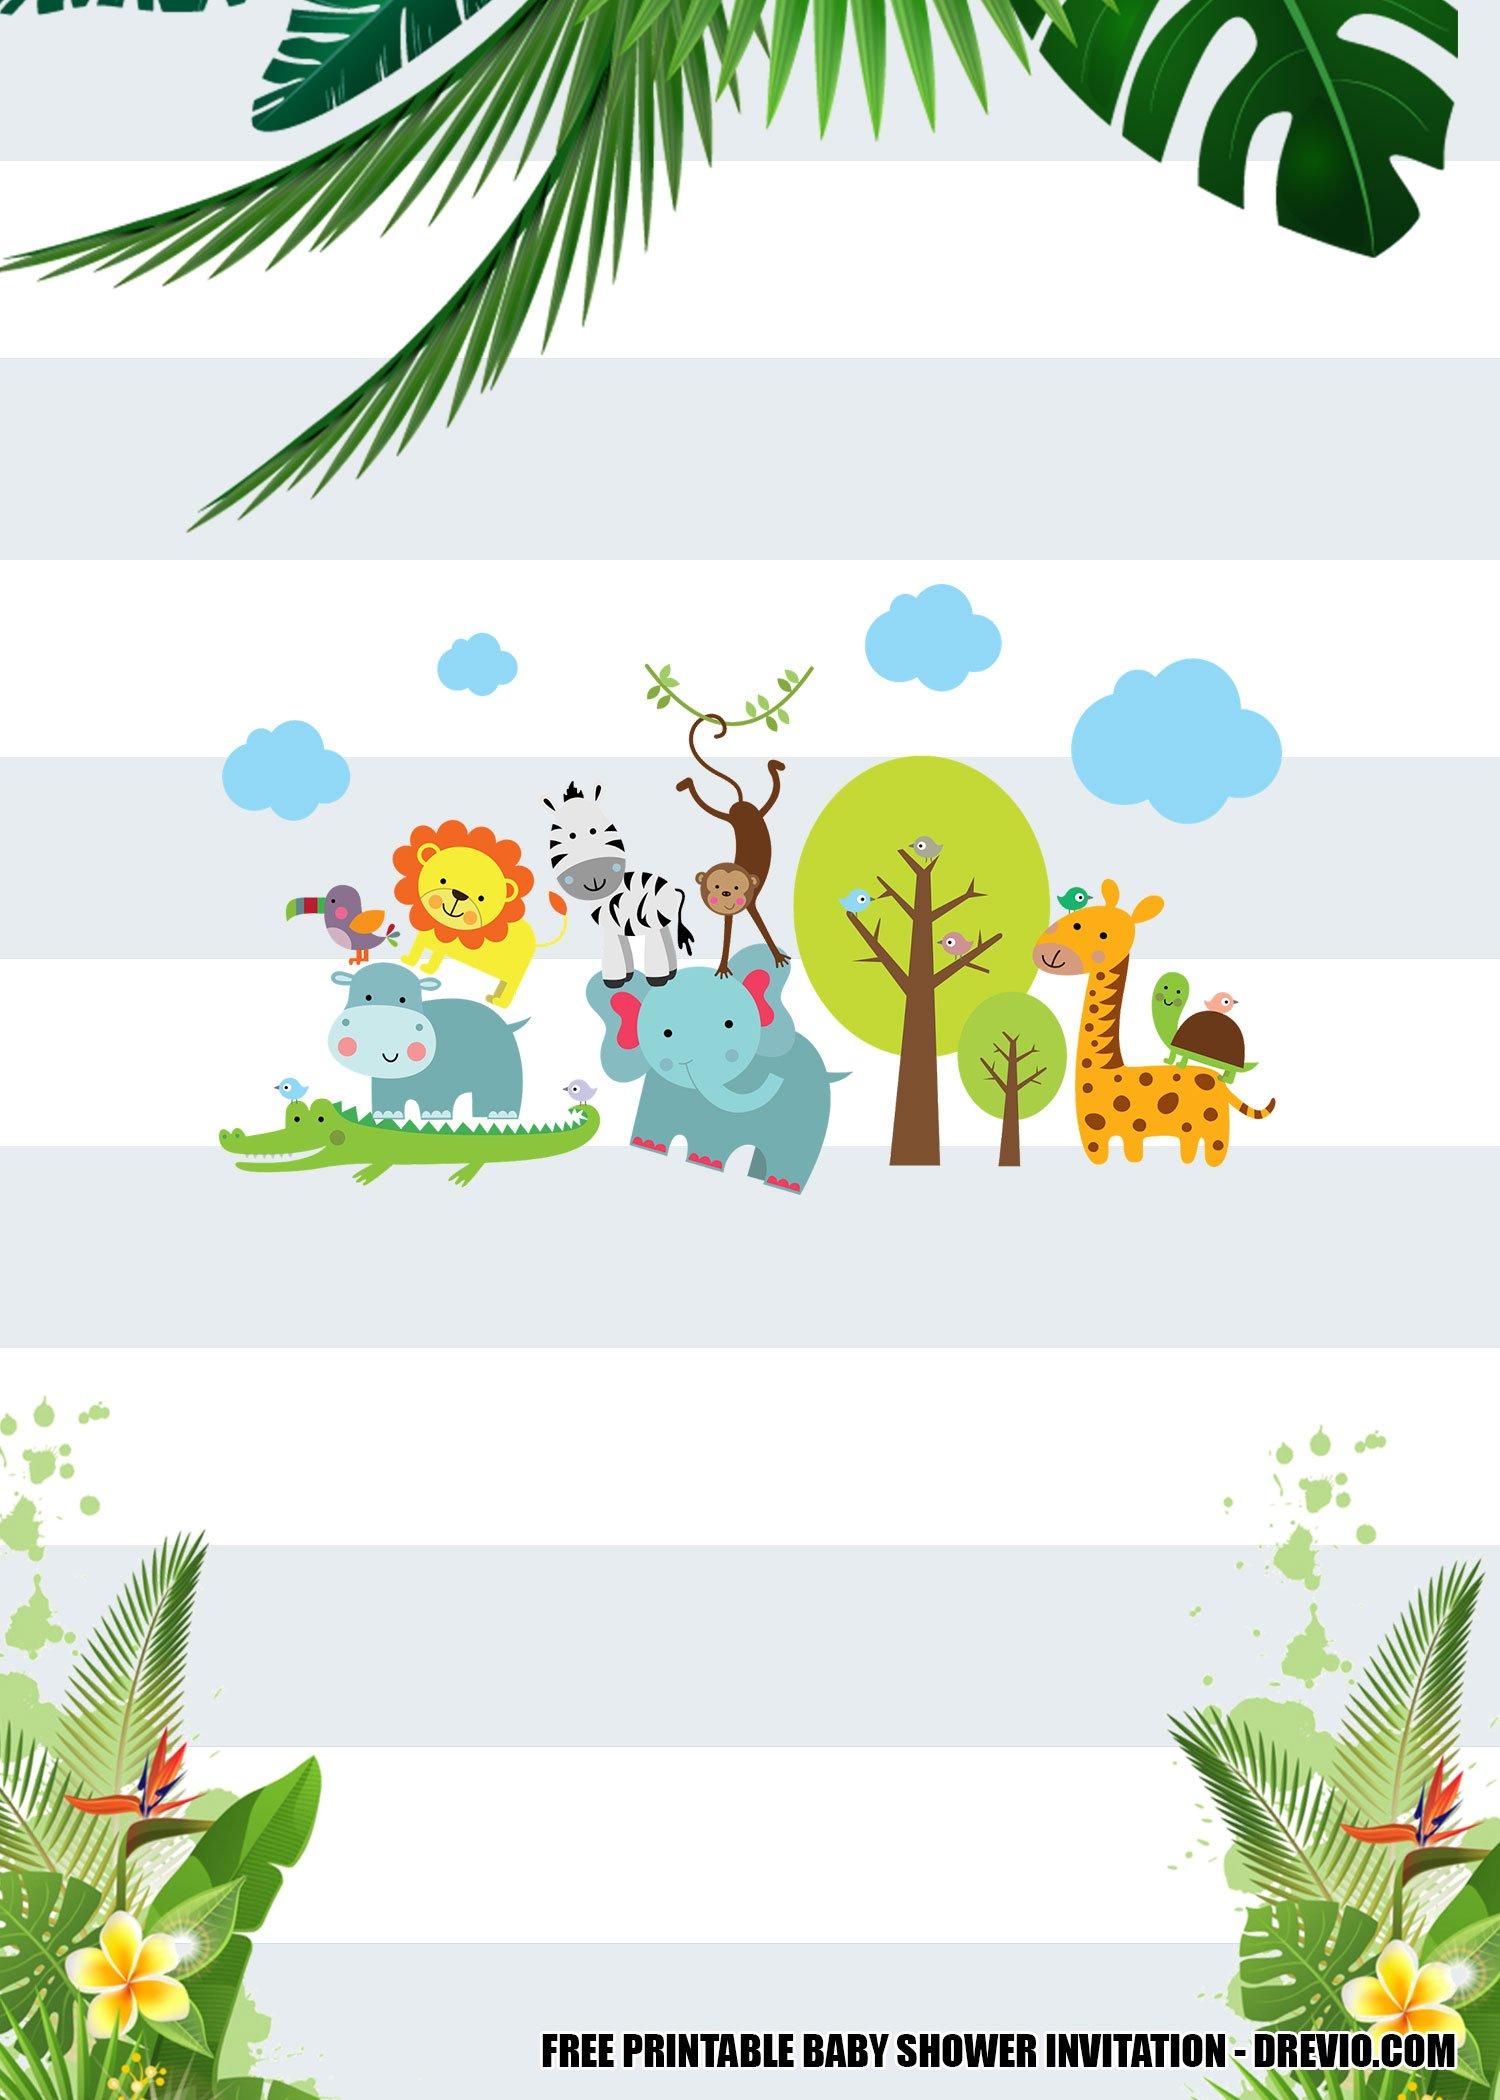 Free Jungle Baby Shower Invitation Templates Bagvania